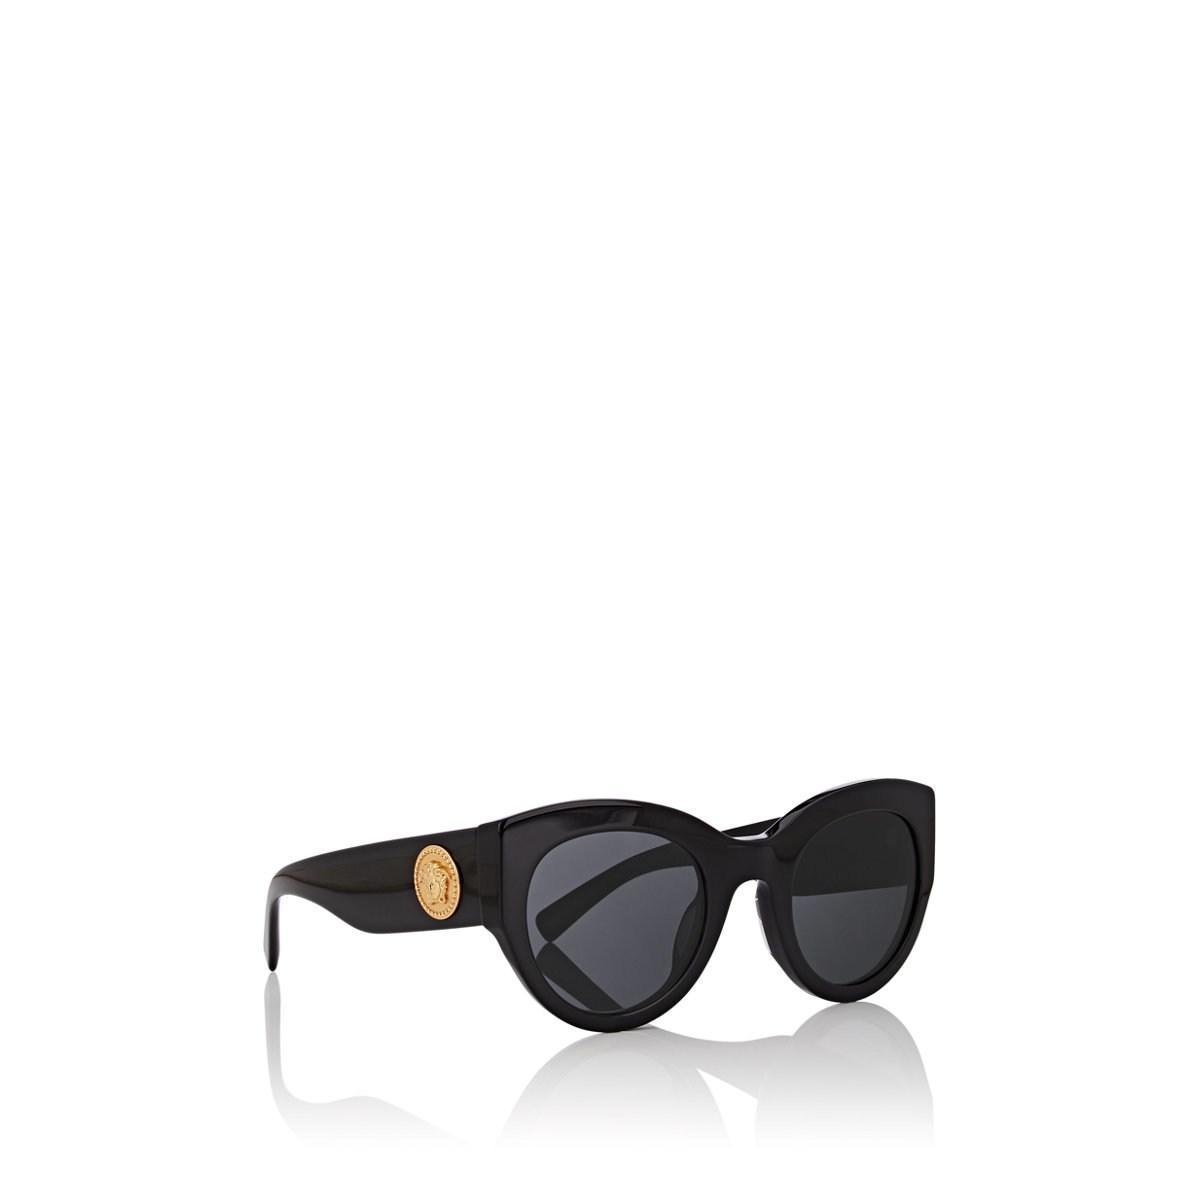 f694be784530 Versace - Black Tribute Sunglasses - Lyst. View fullscreen